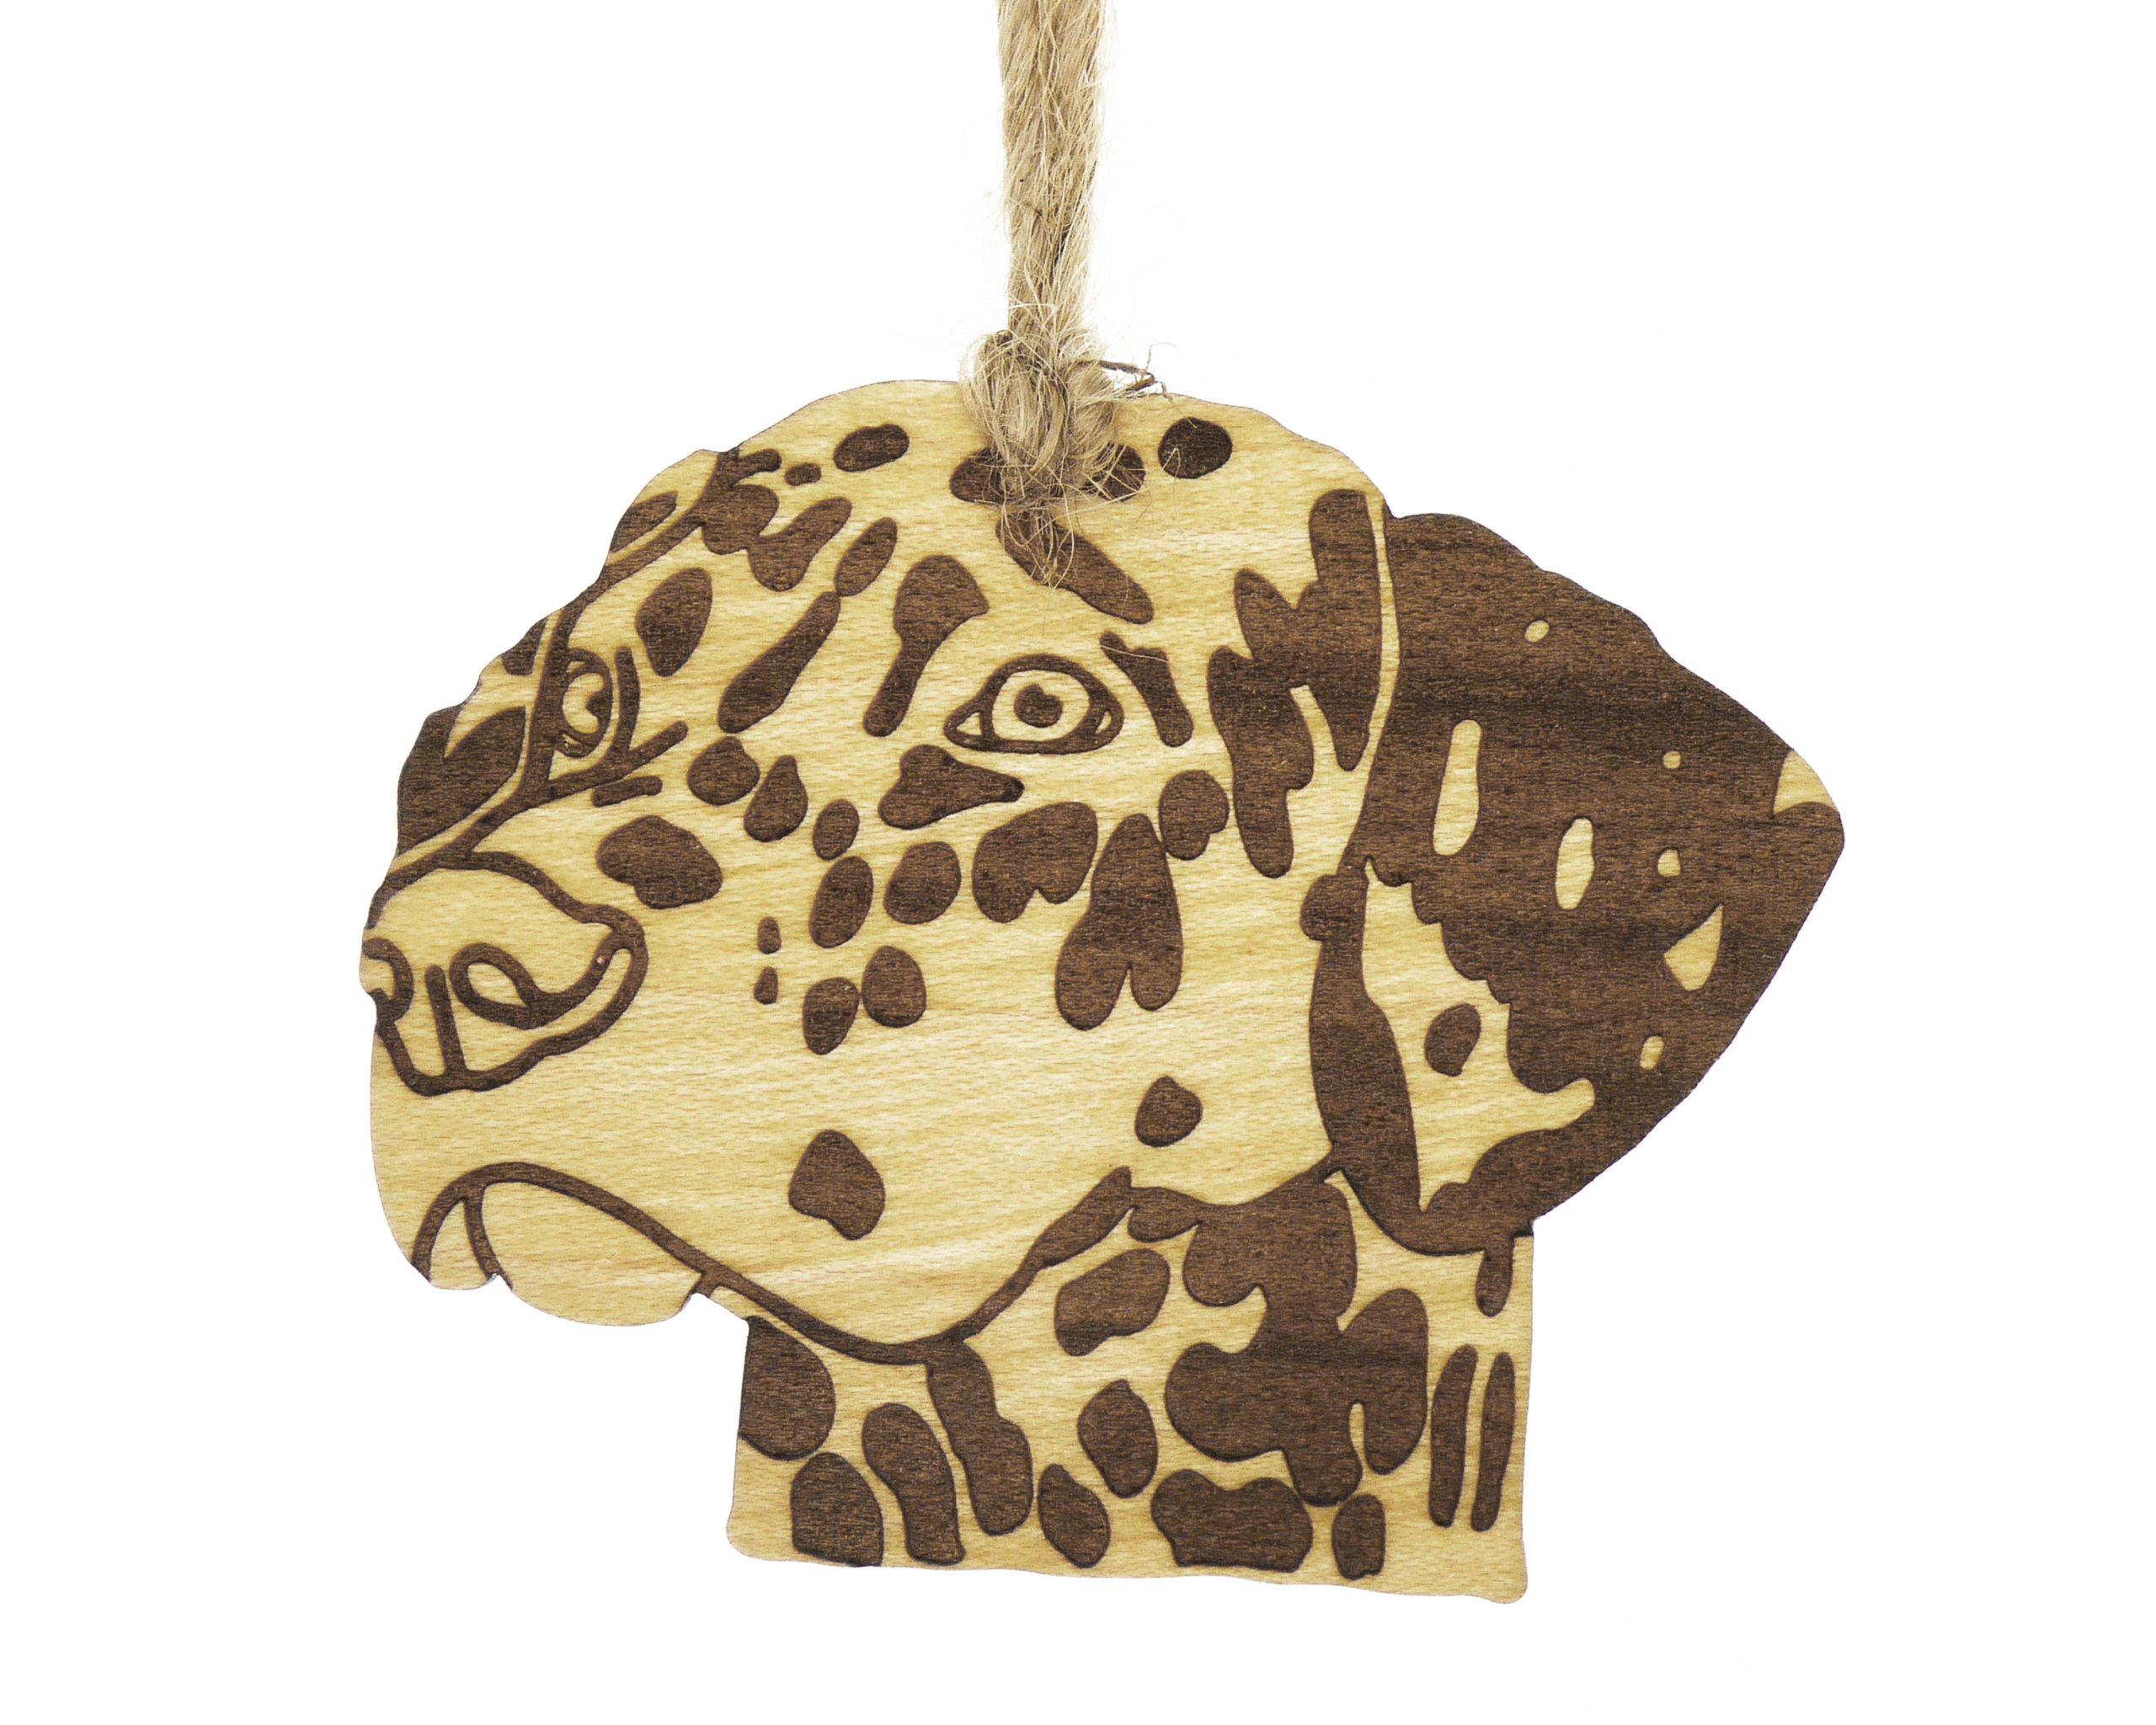 Dalmation Dog Ornament 01 1 scaled